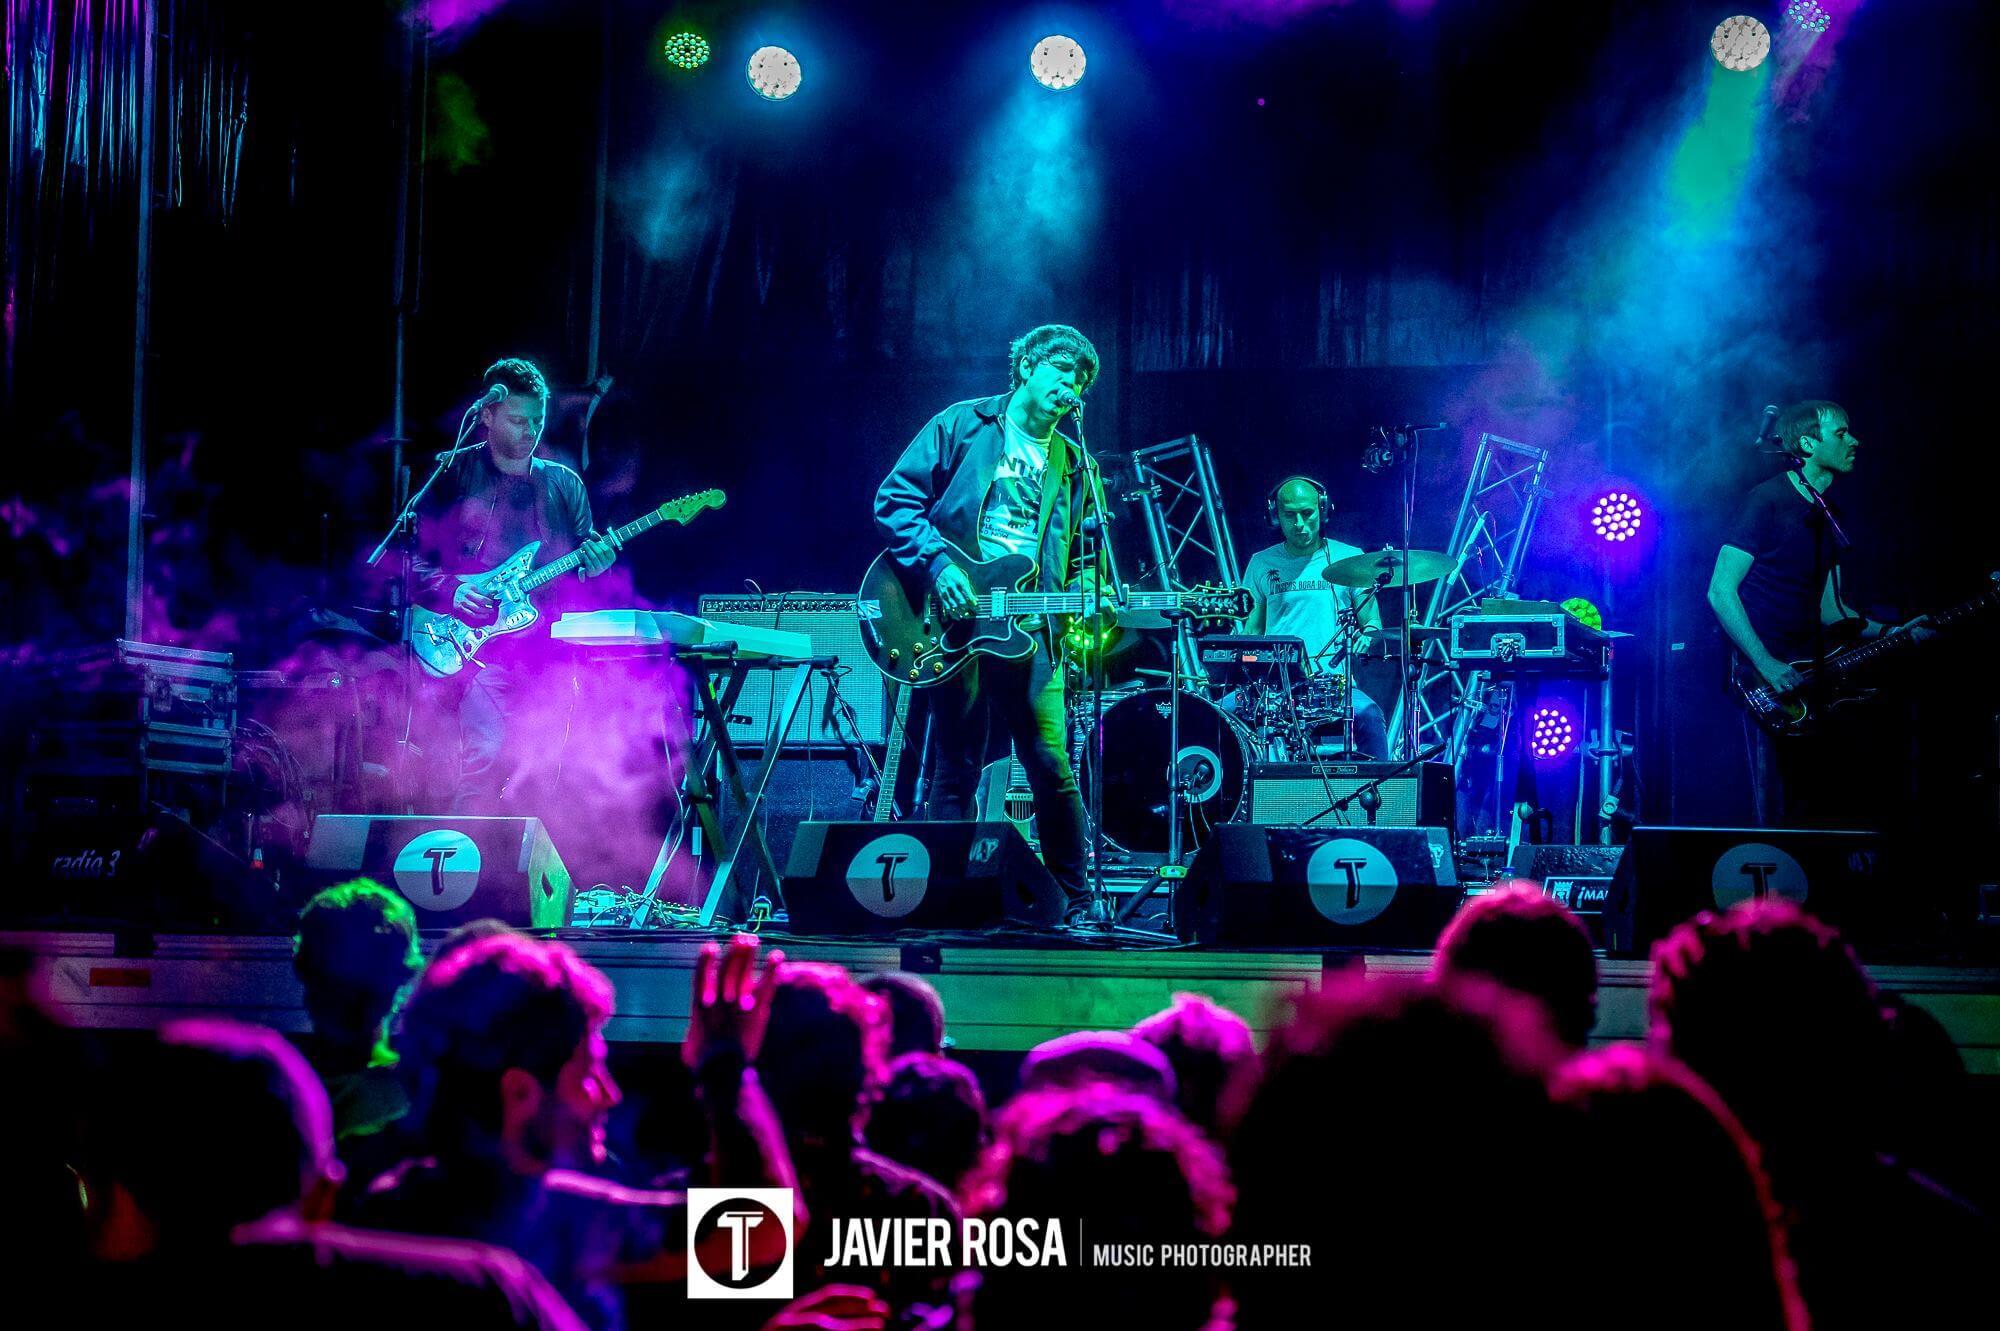 LOST-TAPES_TOMAVISTAS-FESTIVAL-2016_Javier-Rosa-MusicPhotographer_02-2